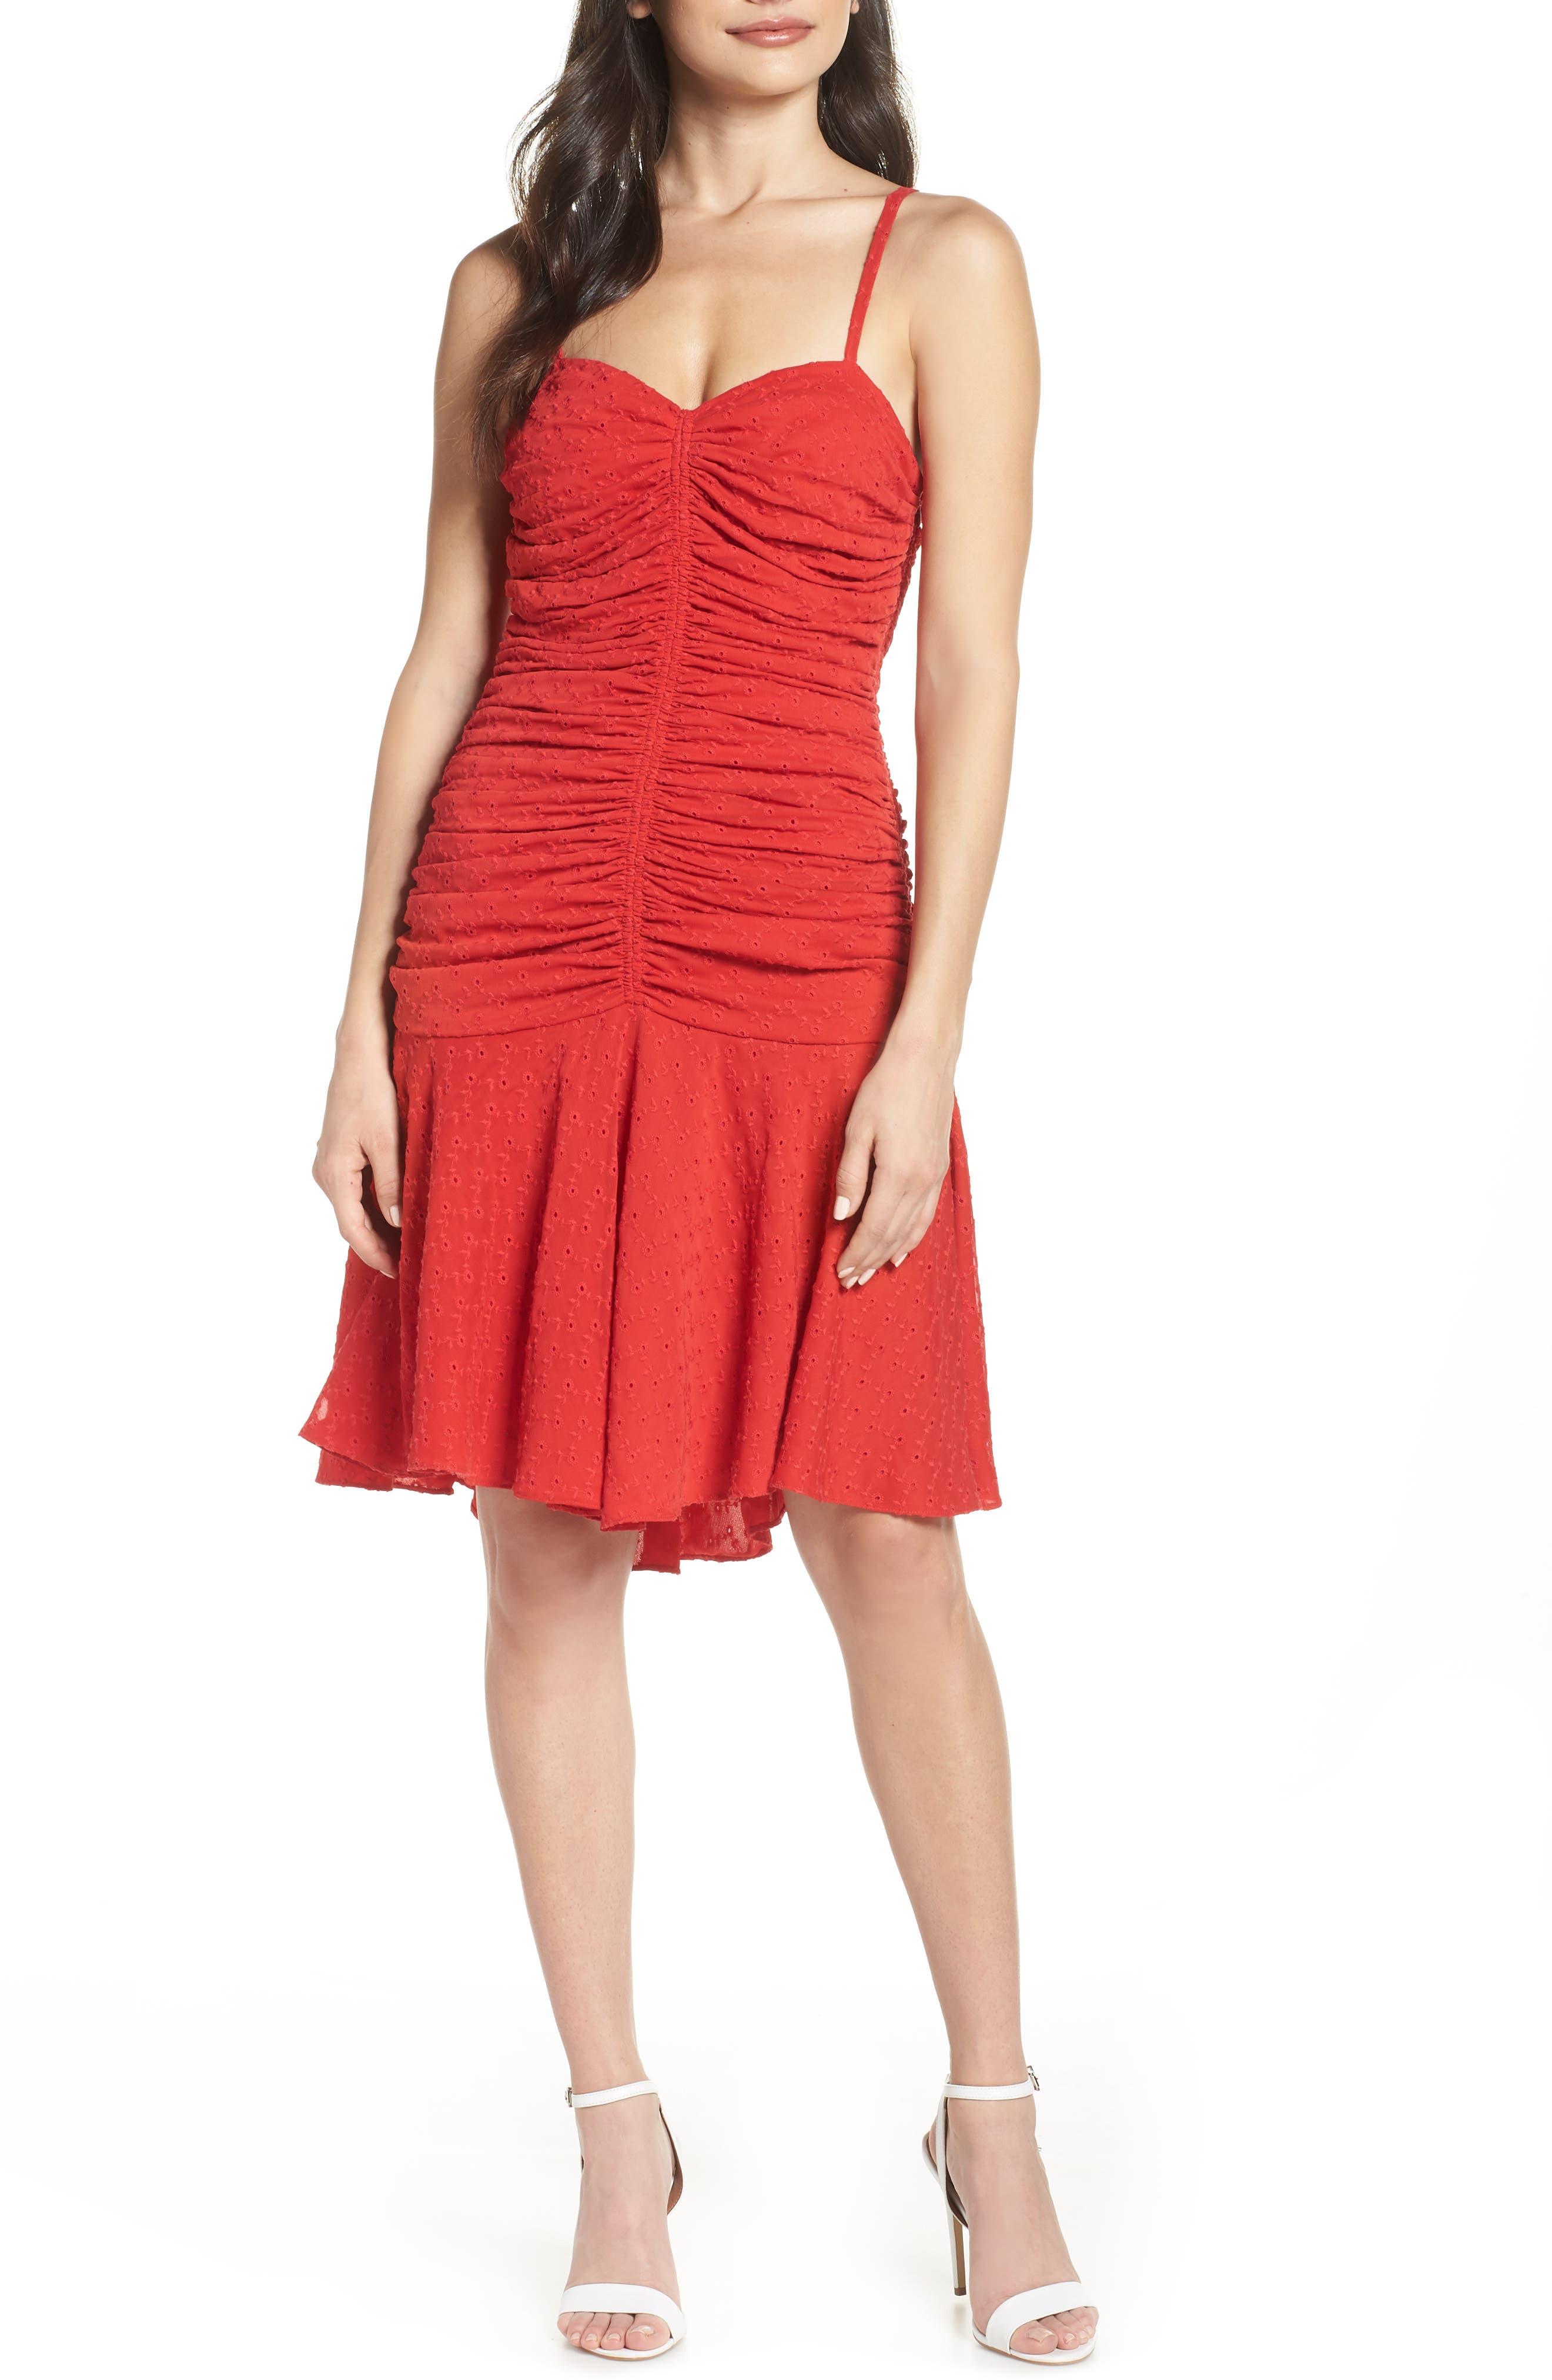 Jill Jill Stuart Ruched Eyelet Dress, Red